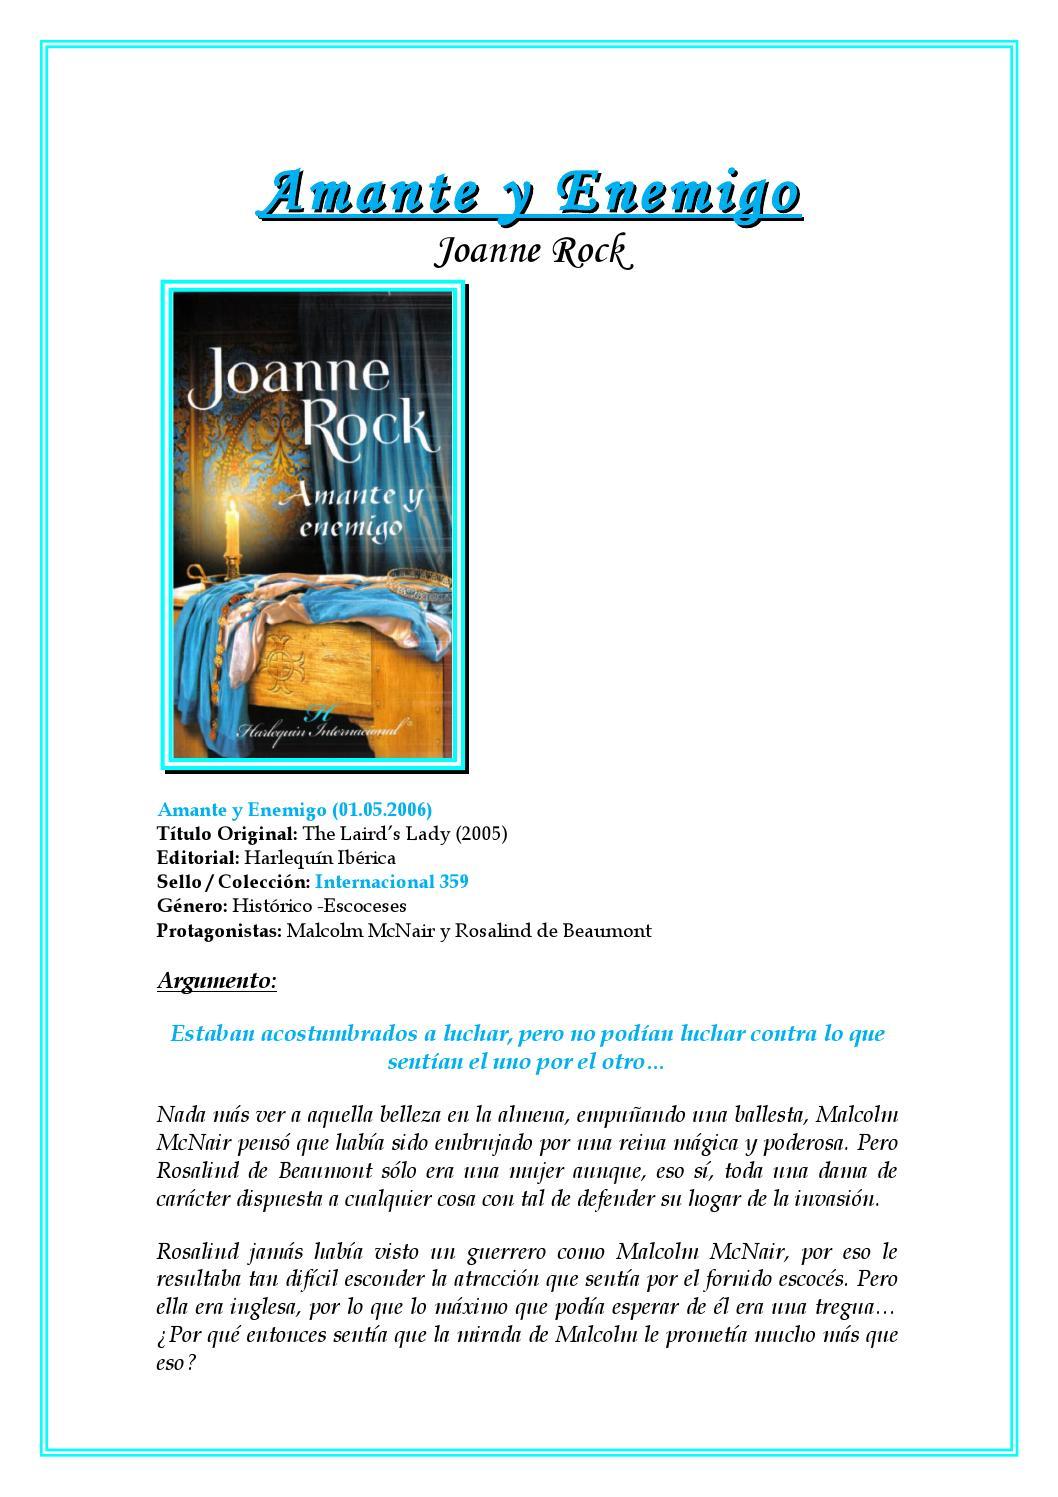 Rock, joanne amante y enemigo by romina lazarte - Issuu